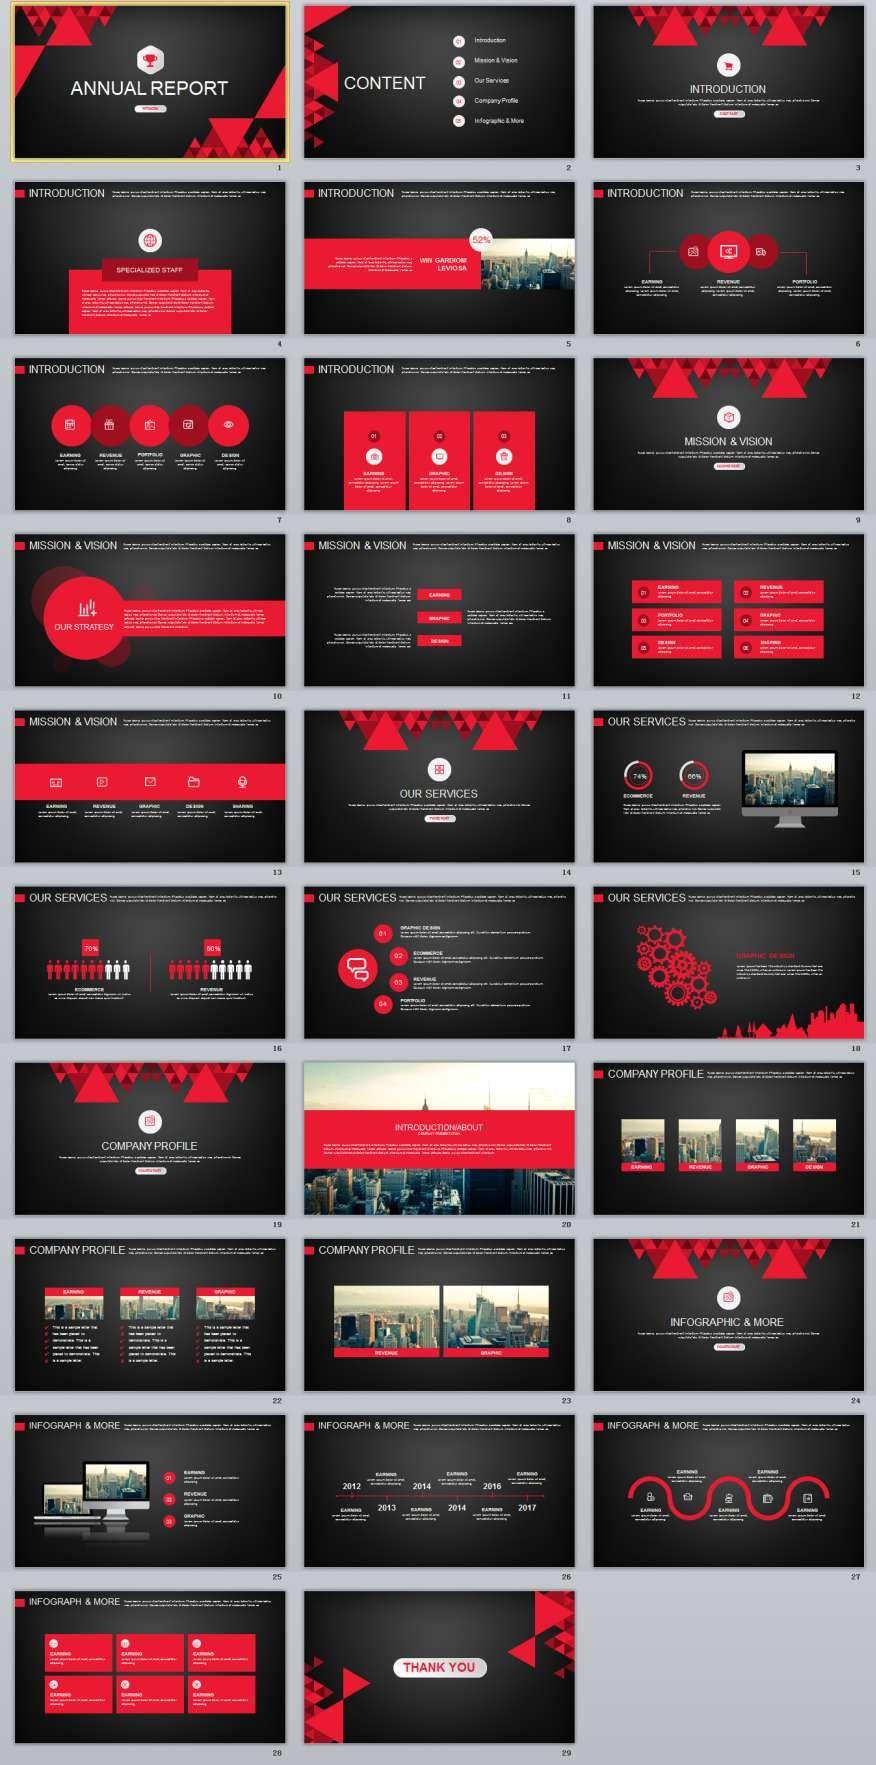 29 red black annual report powerpoint templates annual reports 29 red black annual report powerpoint templates toneelgroepblik Choice Image